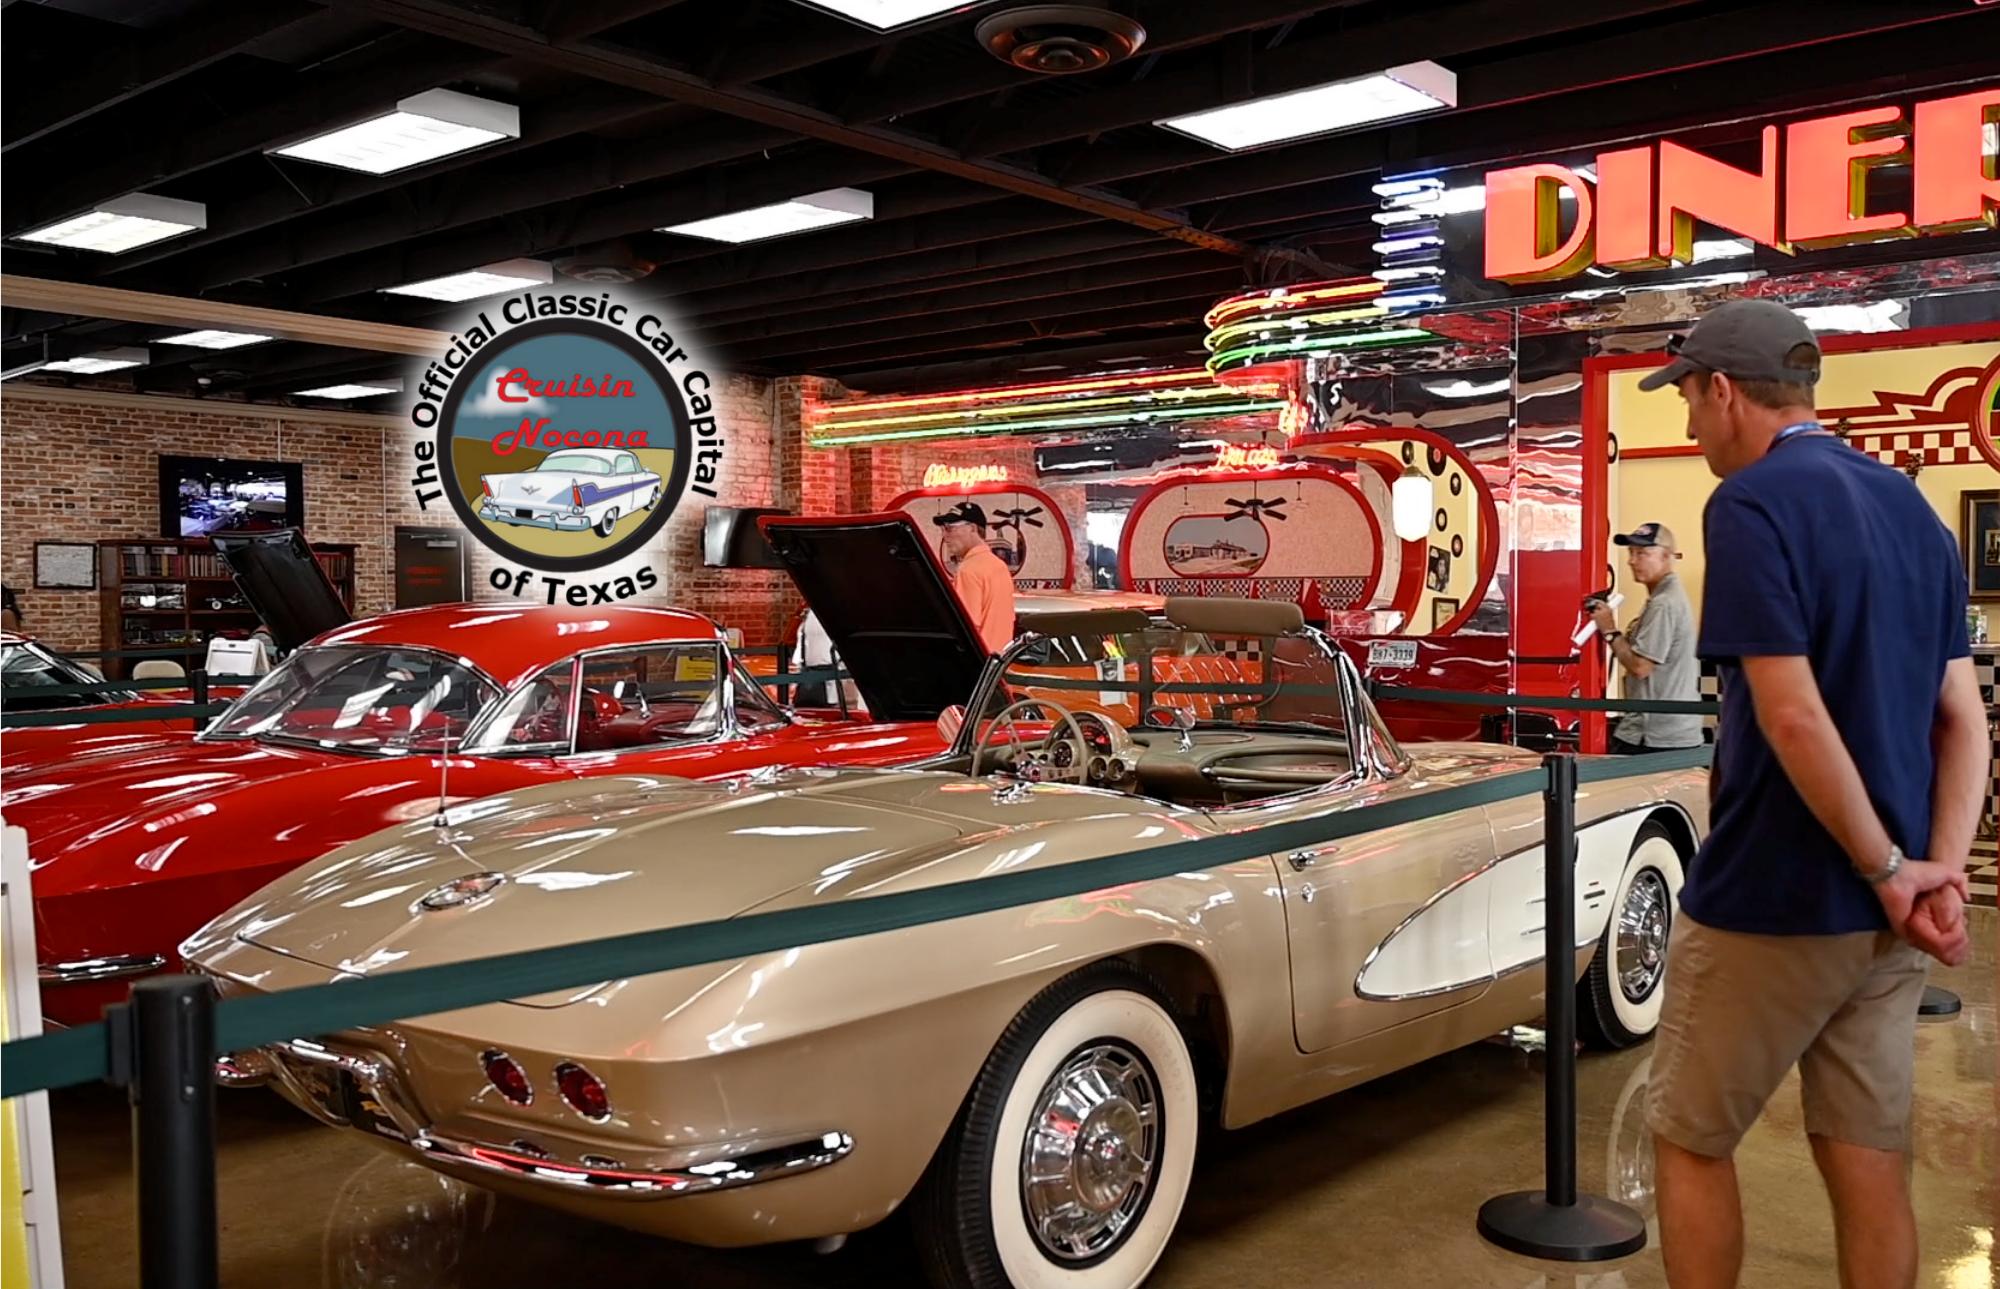 The Classic Car Capital of Texas